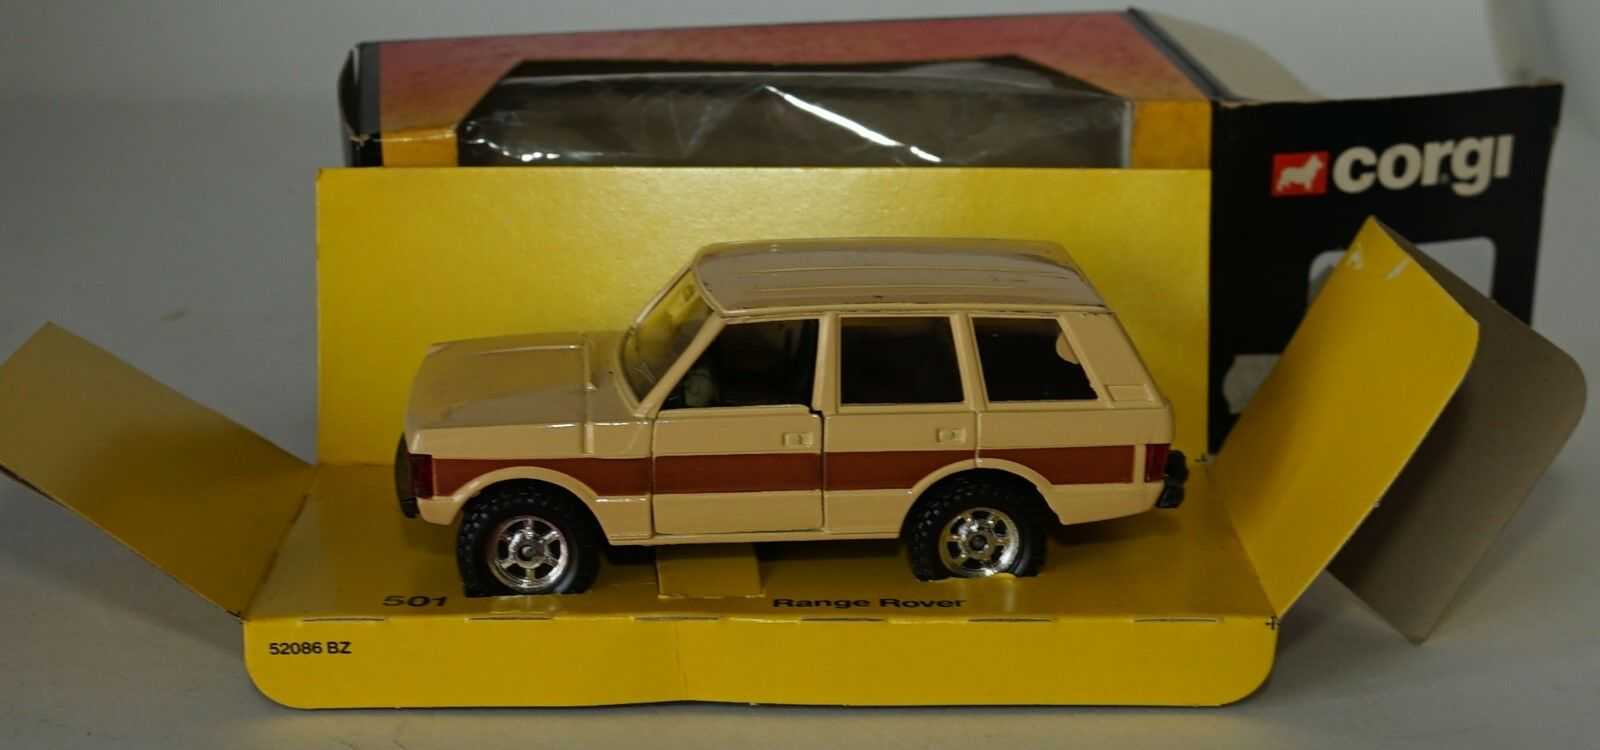 Corgi 501 Range Rover in 1 36 scale